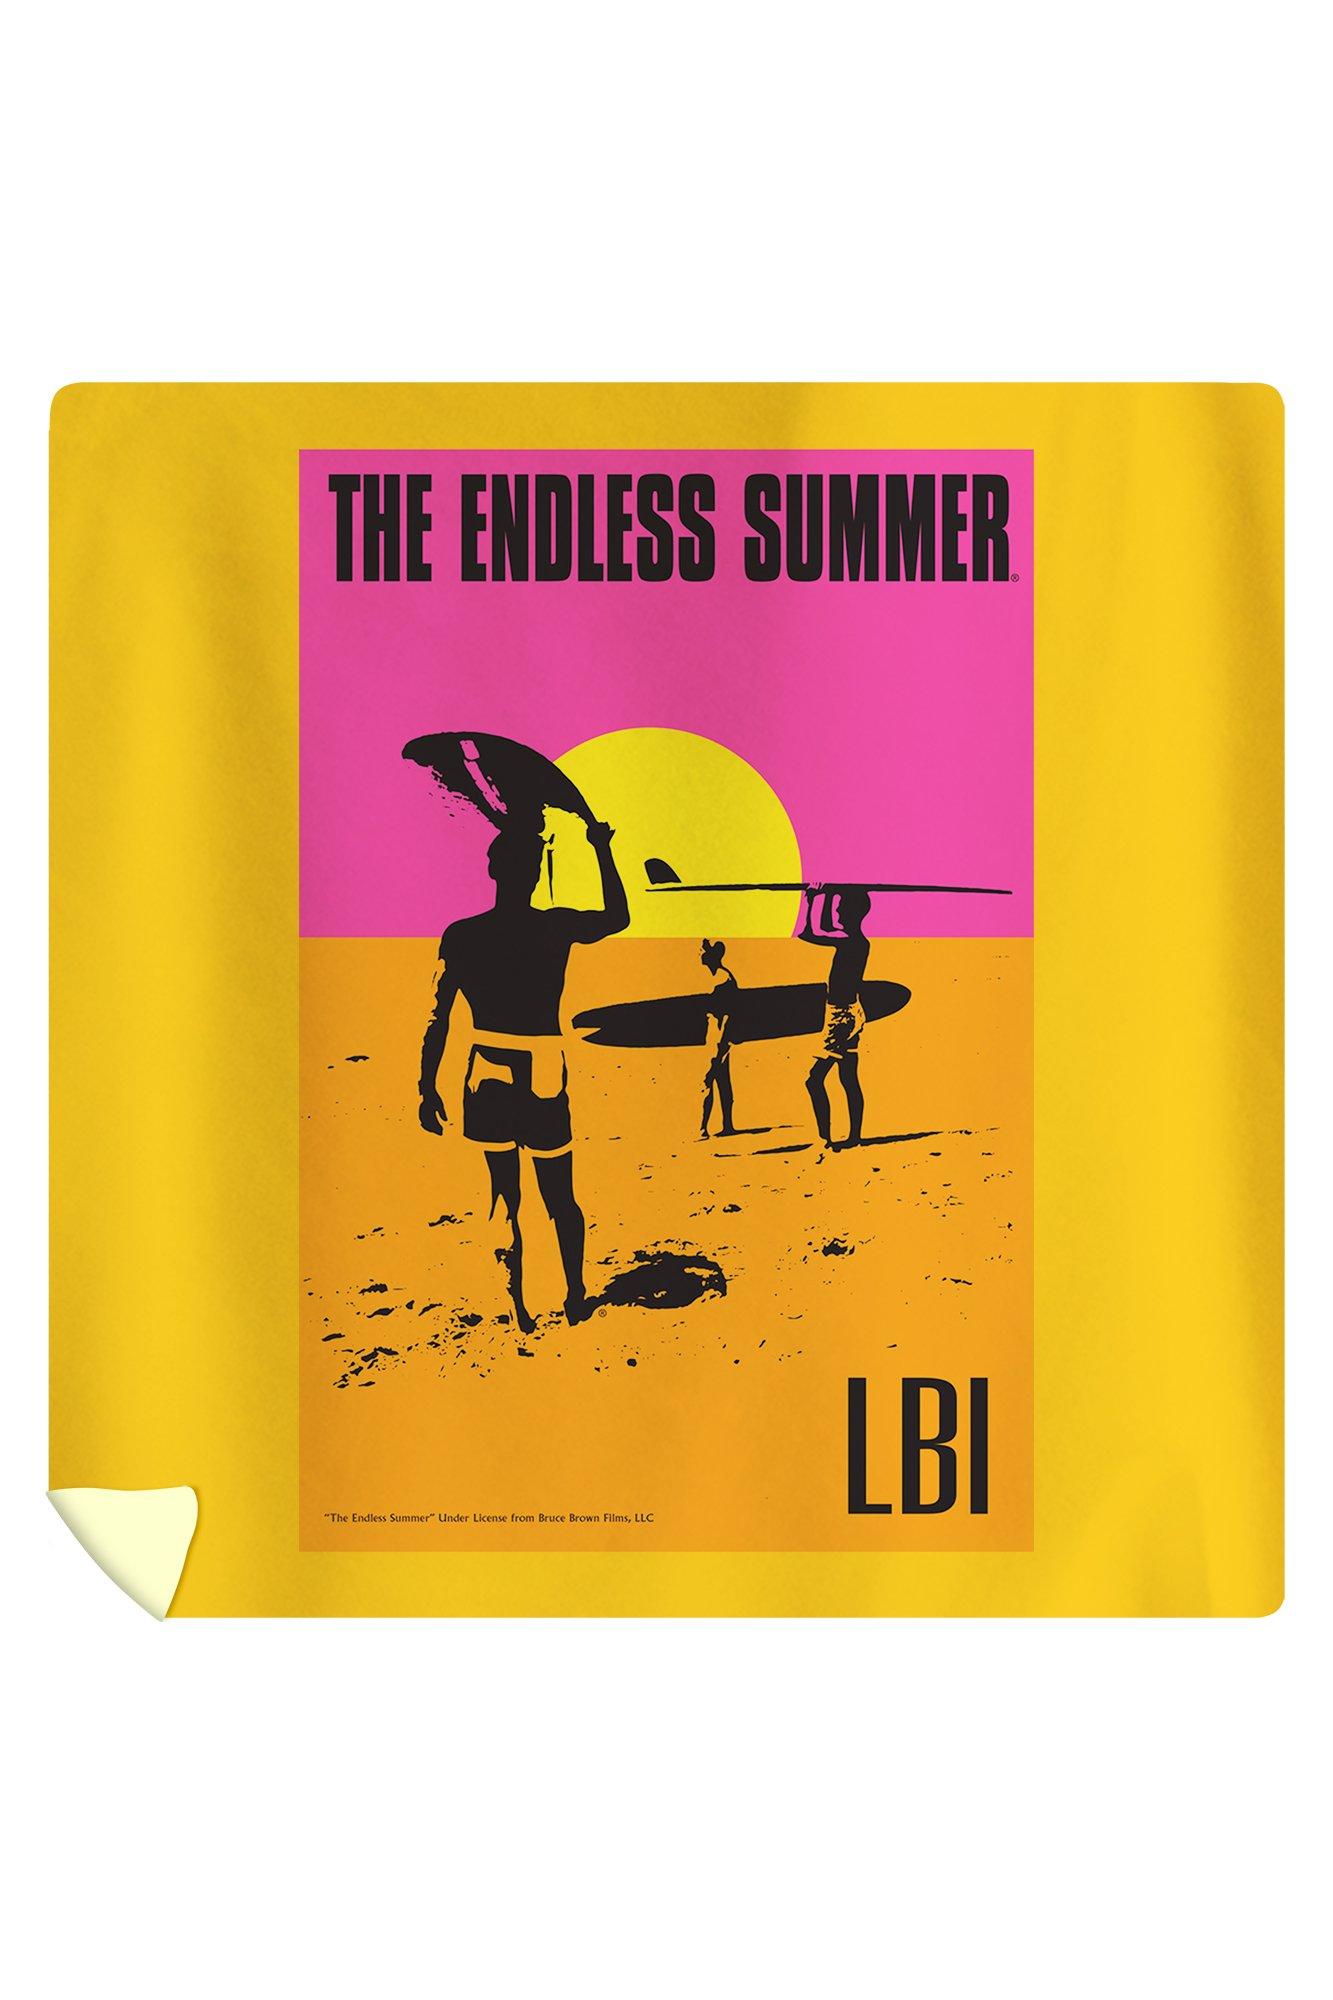 LBI - The Endless Summer - Original Movie Poster (88x88 Queen Microfiber Duvet Cover)